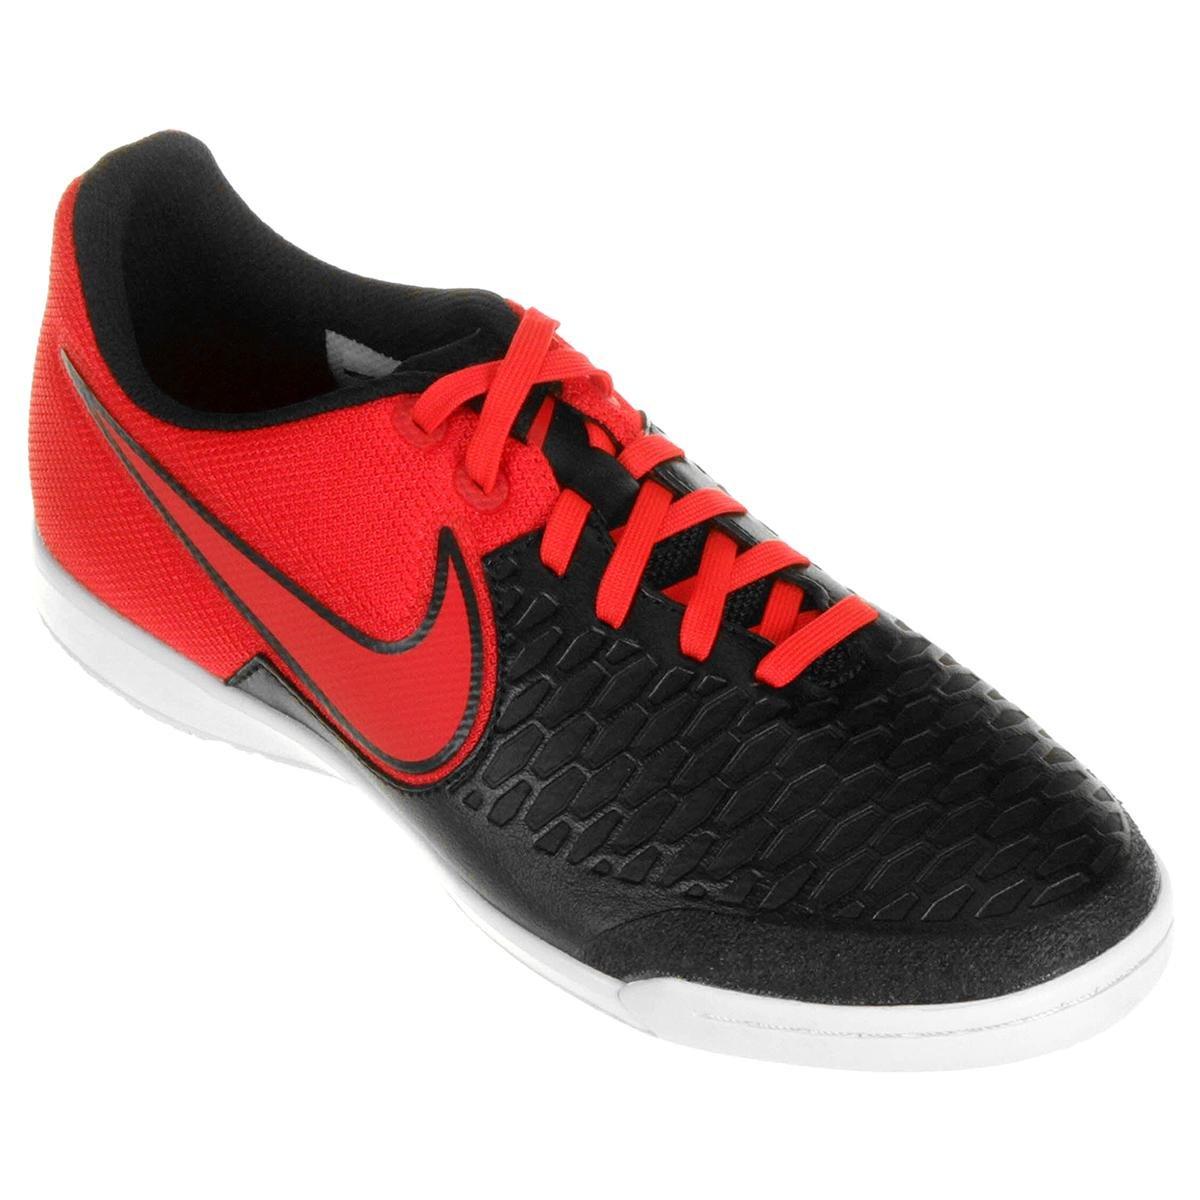 7e9fde96d5 Chuteira Nike Magista X Pro IC Futsal - Compre Agora